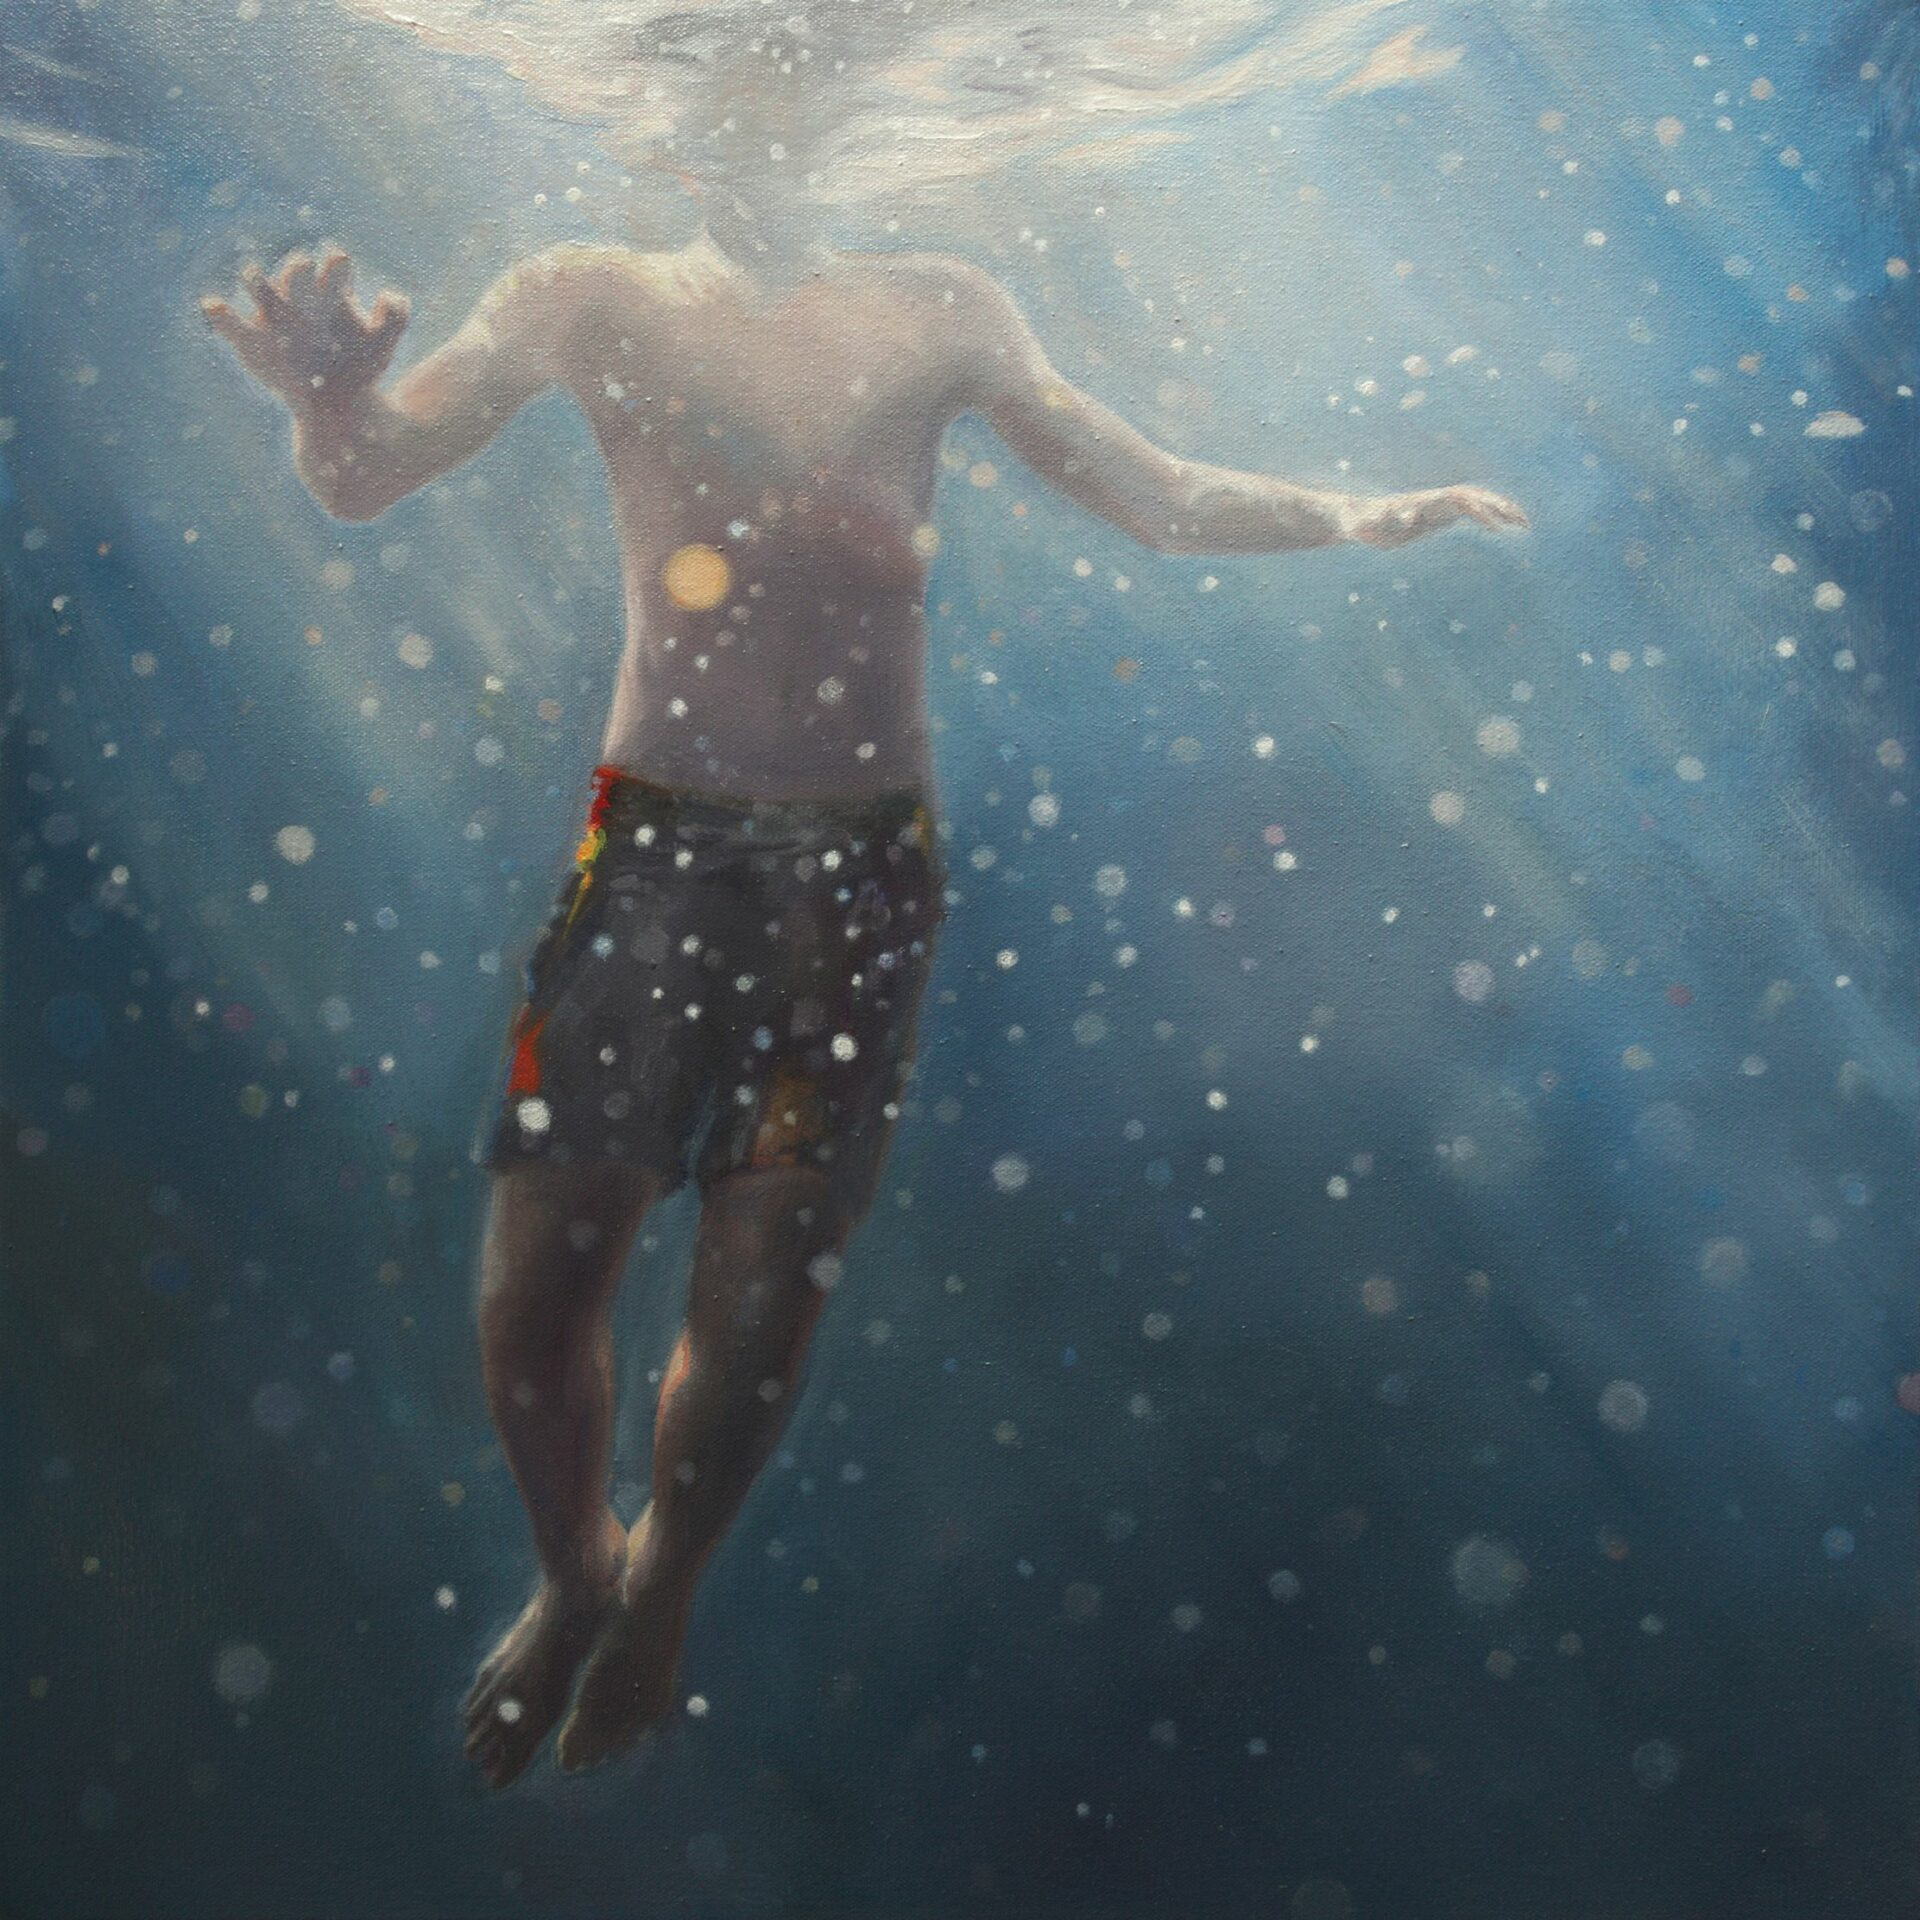 JENNIFER WALTON Haze, 2017, Oil on canvas, 19 x 19 inches, 48 x 48 cm